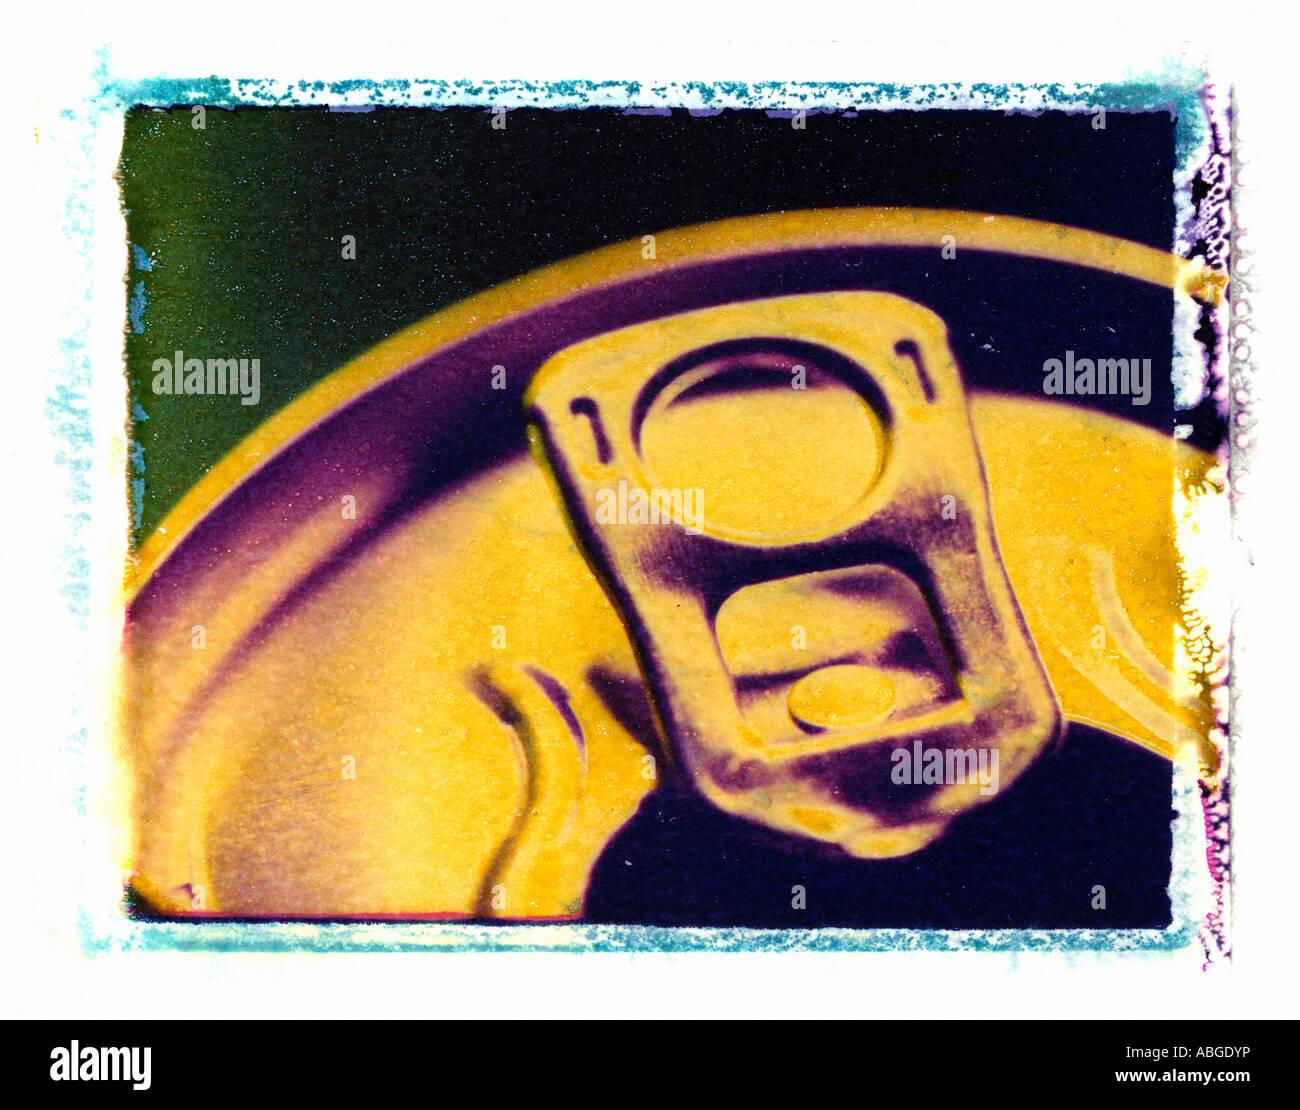 Latas en Polaroid Image Transfer Imagen De Stock